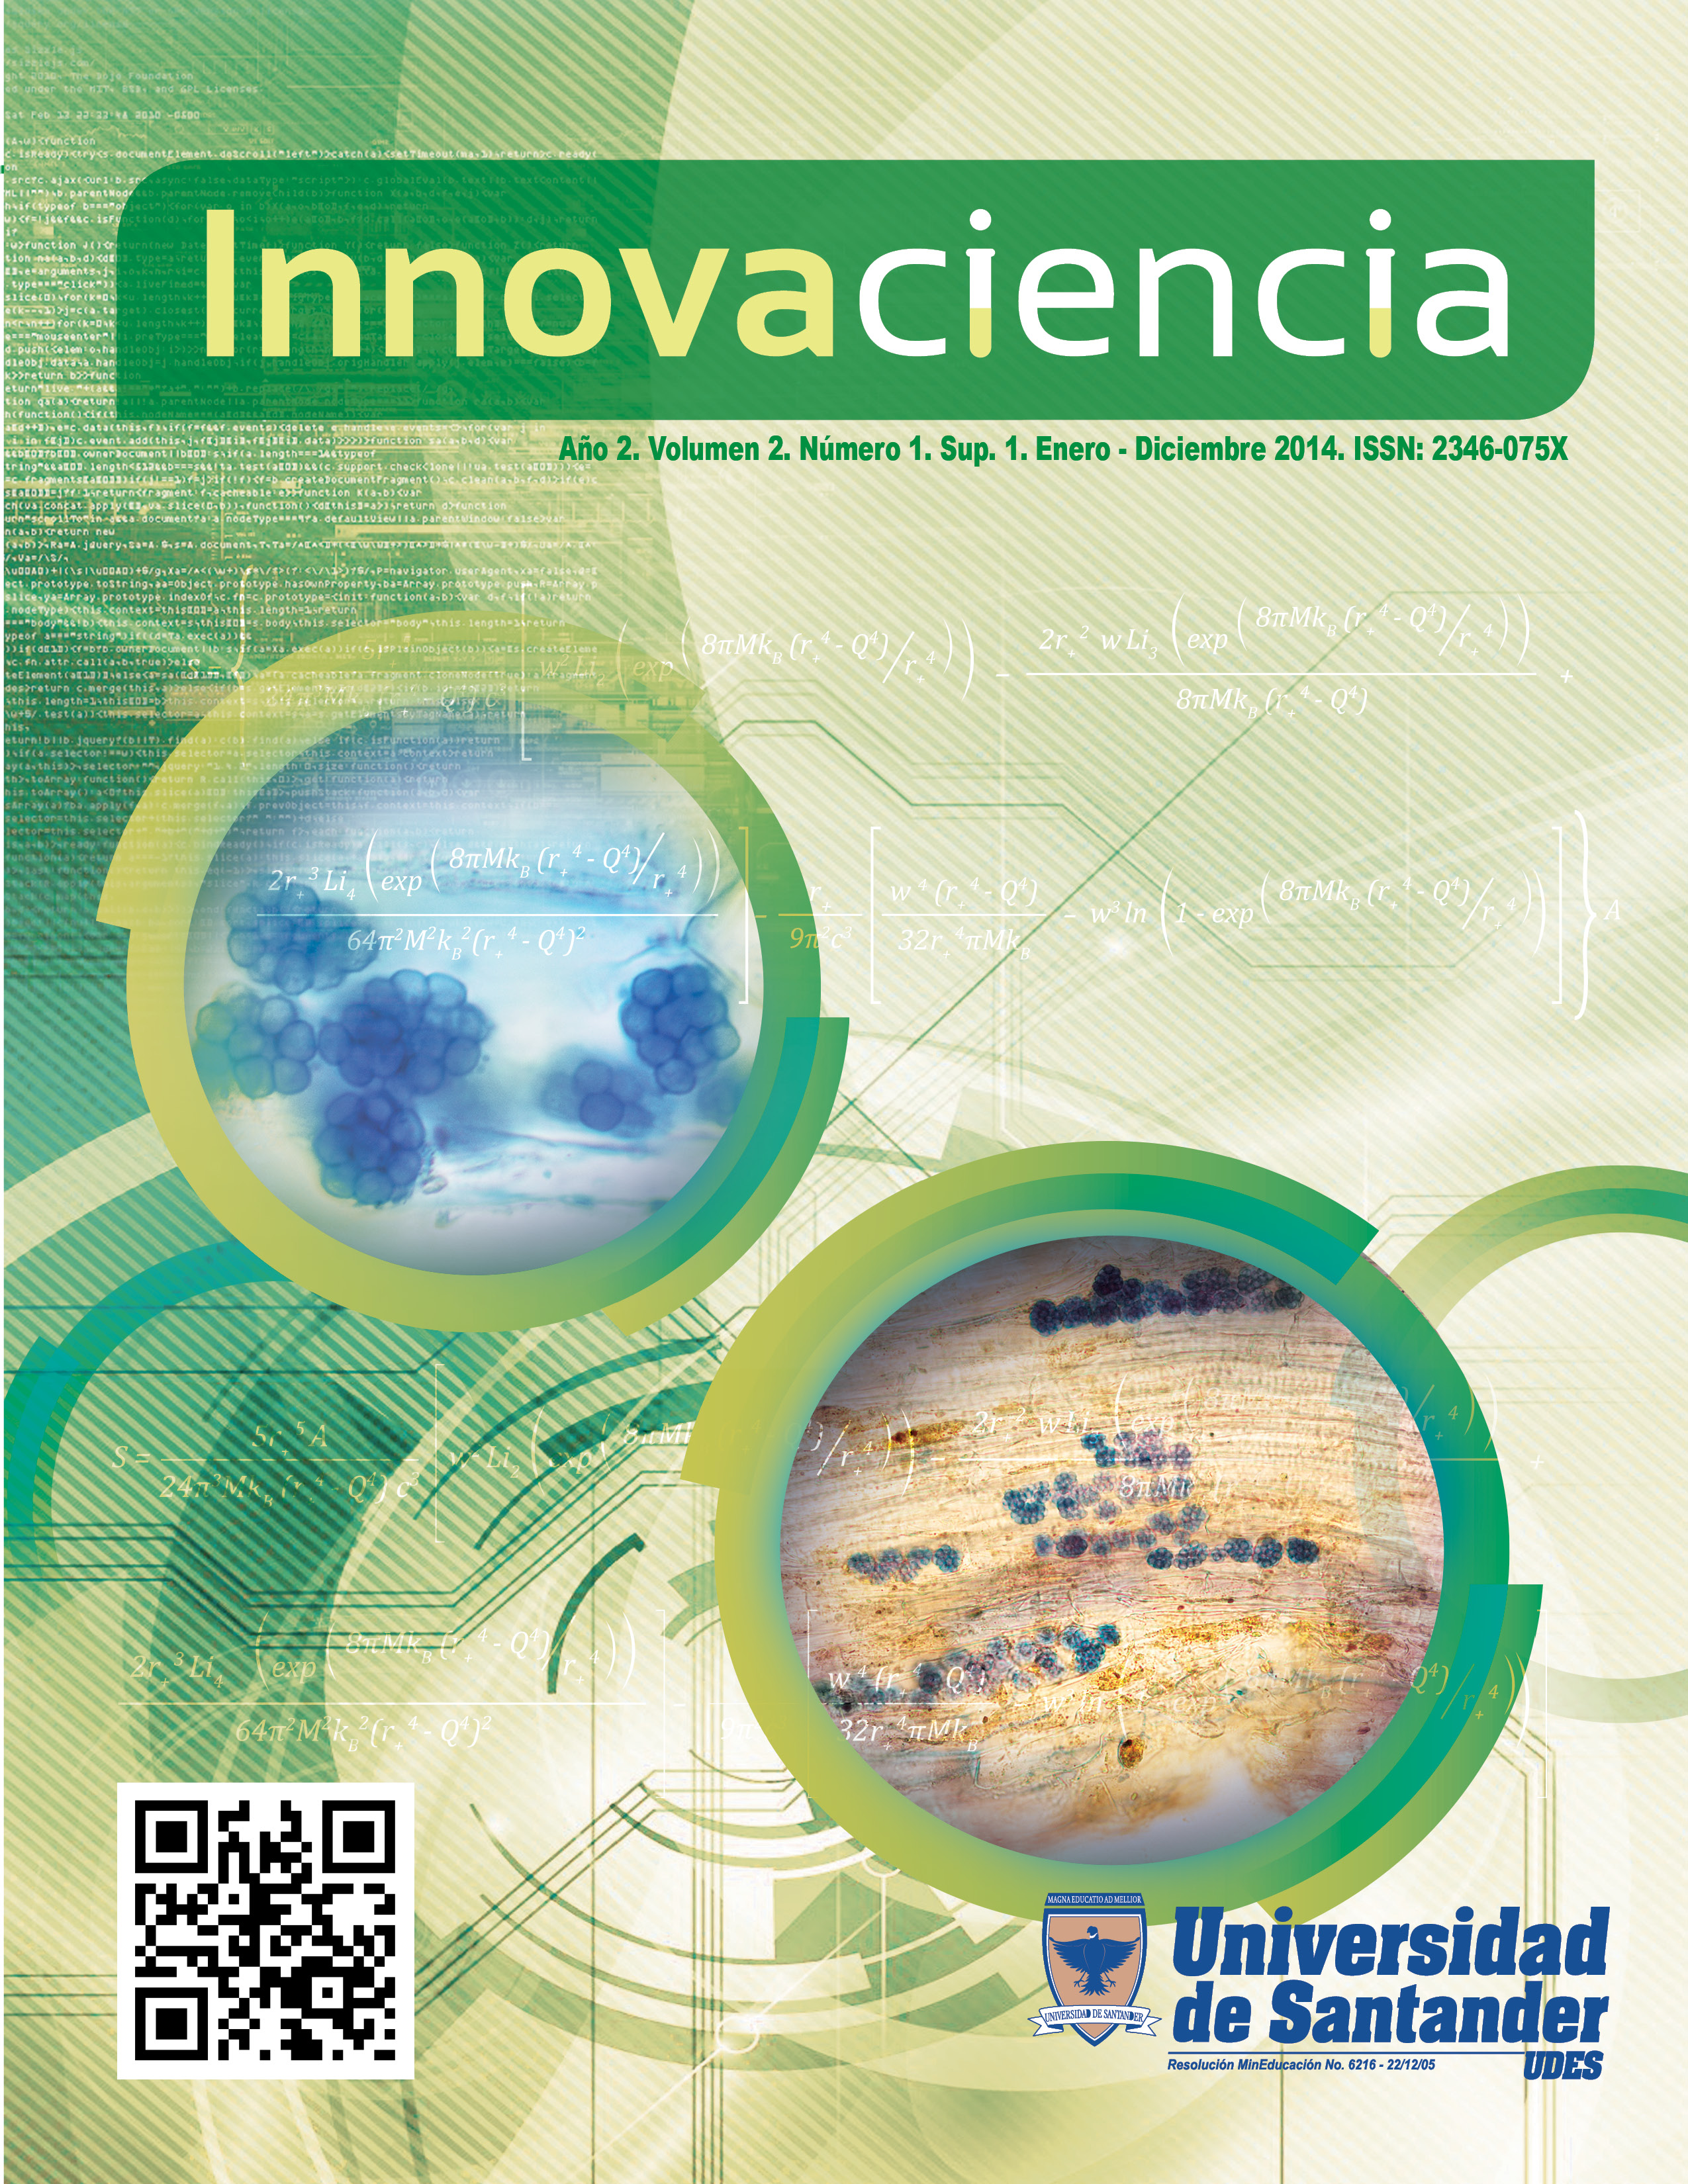 Portada revista Innovaciencia Volúmen 2 1 S1 (2014)